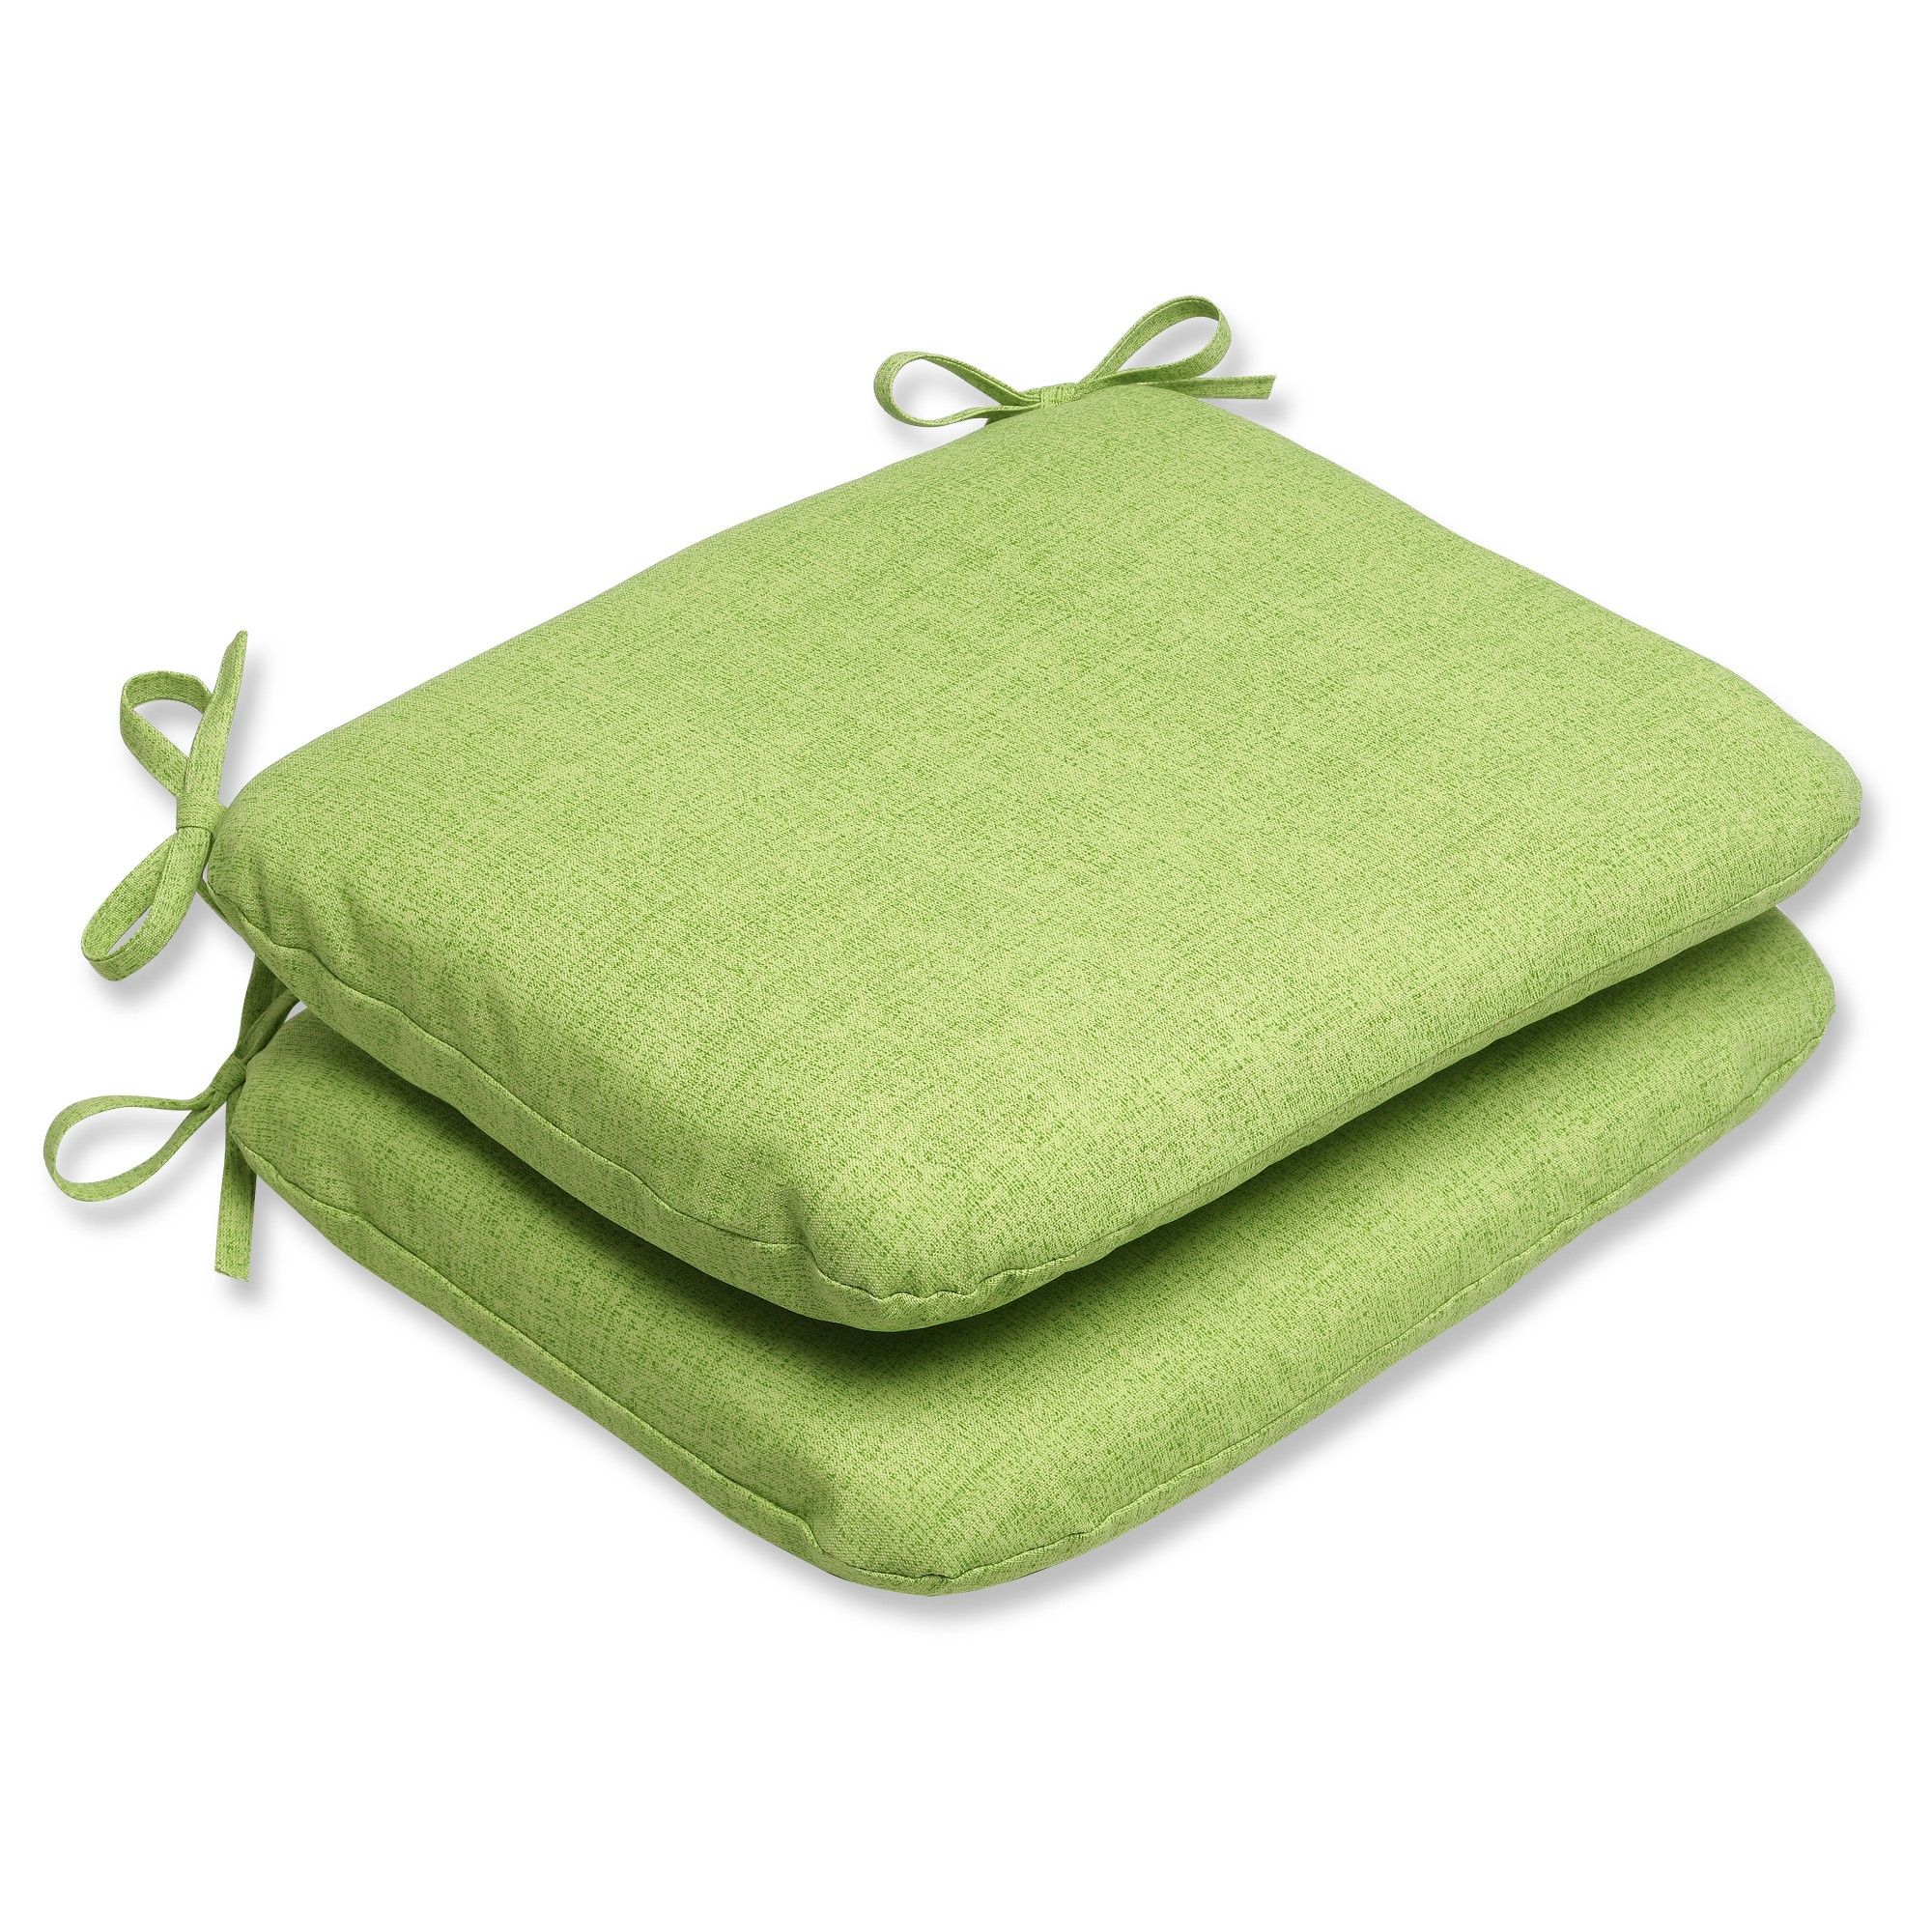 Outdoor 2-Piece Chair Cushion Set - Green